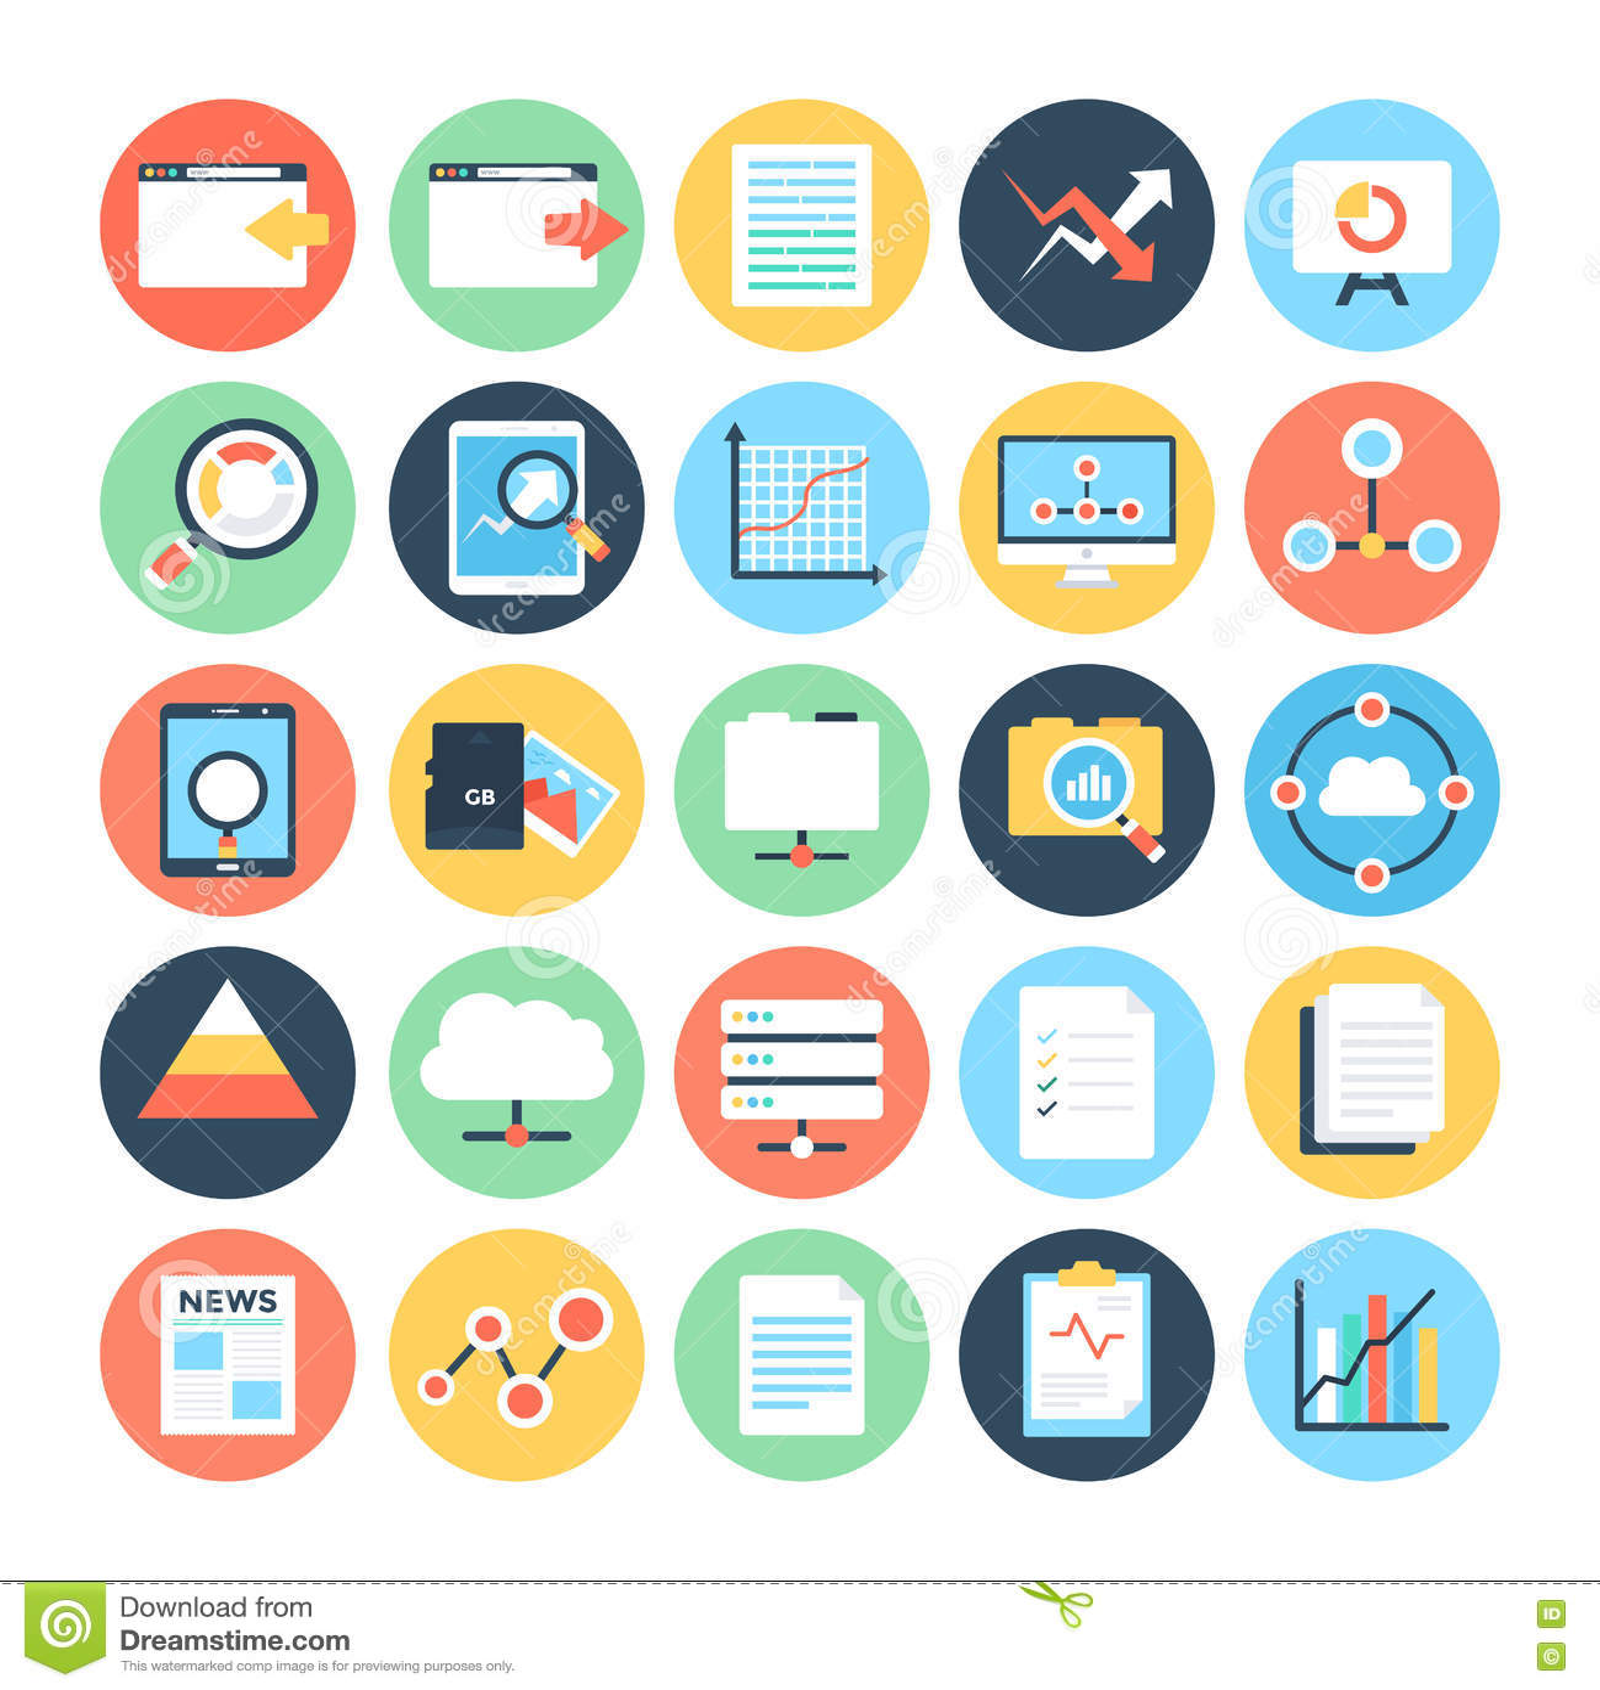 data science vector icons 3 stock illustration illustration of